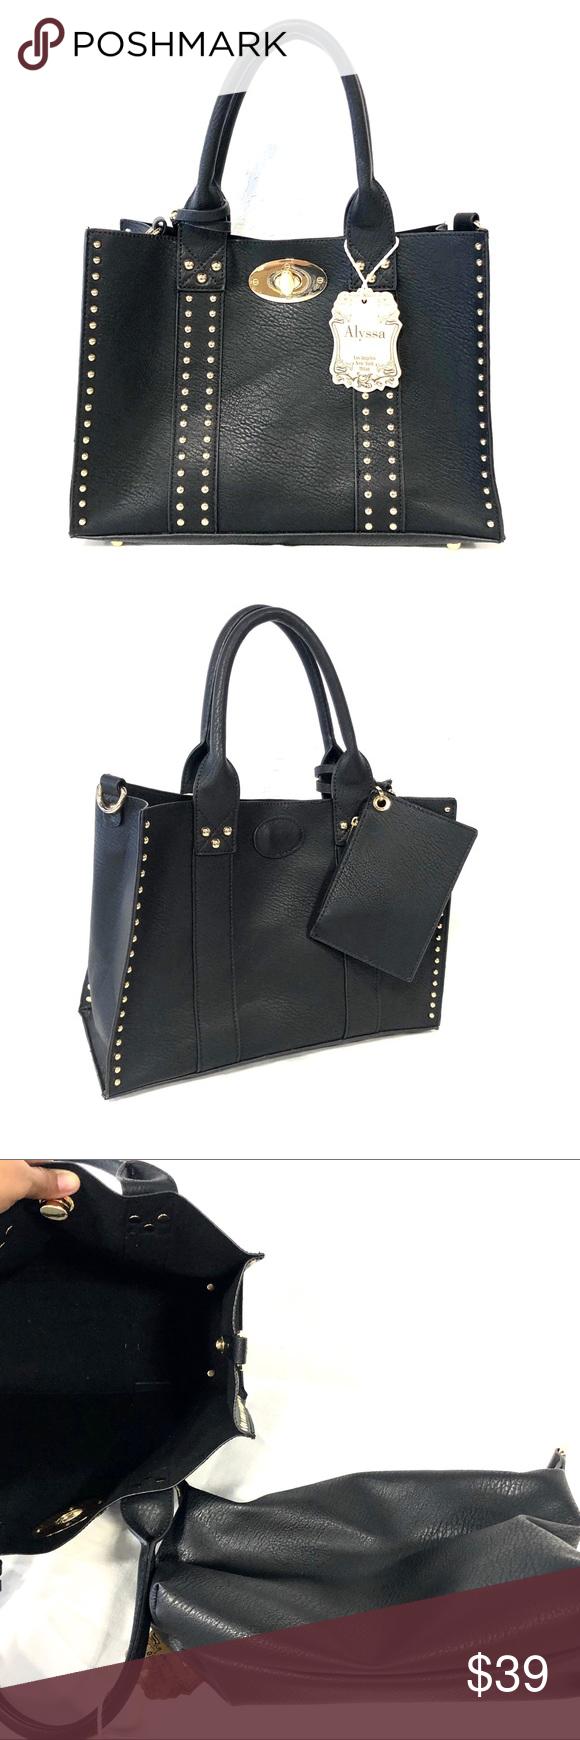 Alyssa Black Handbag Purse Bags Black Handbags Handbag Bags